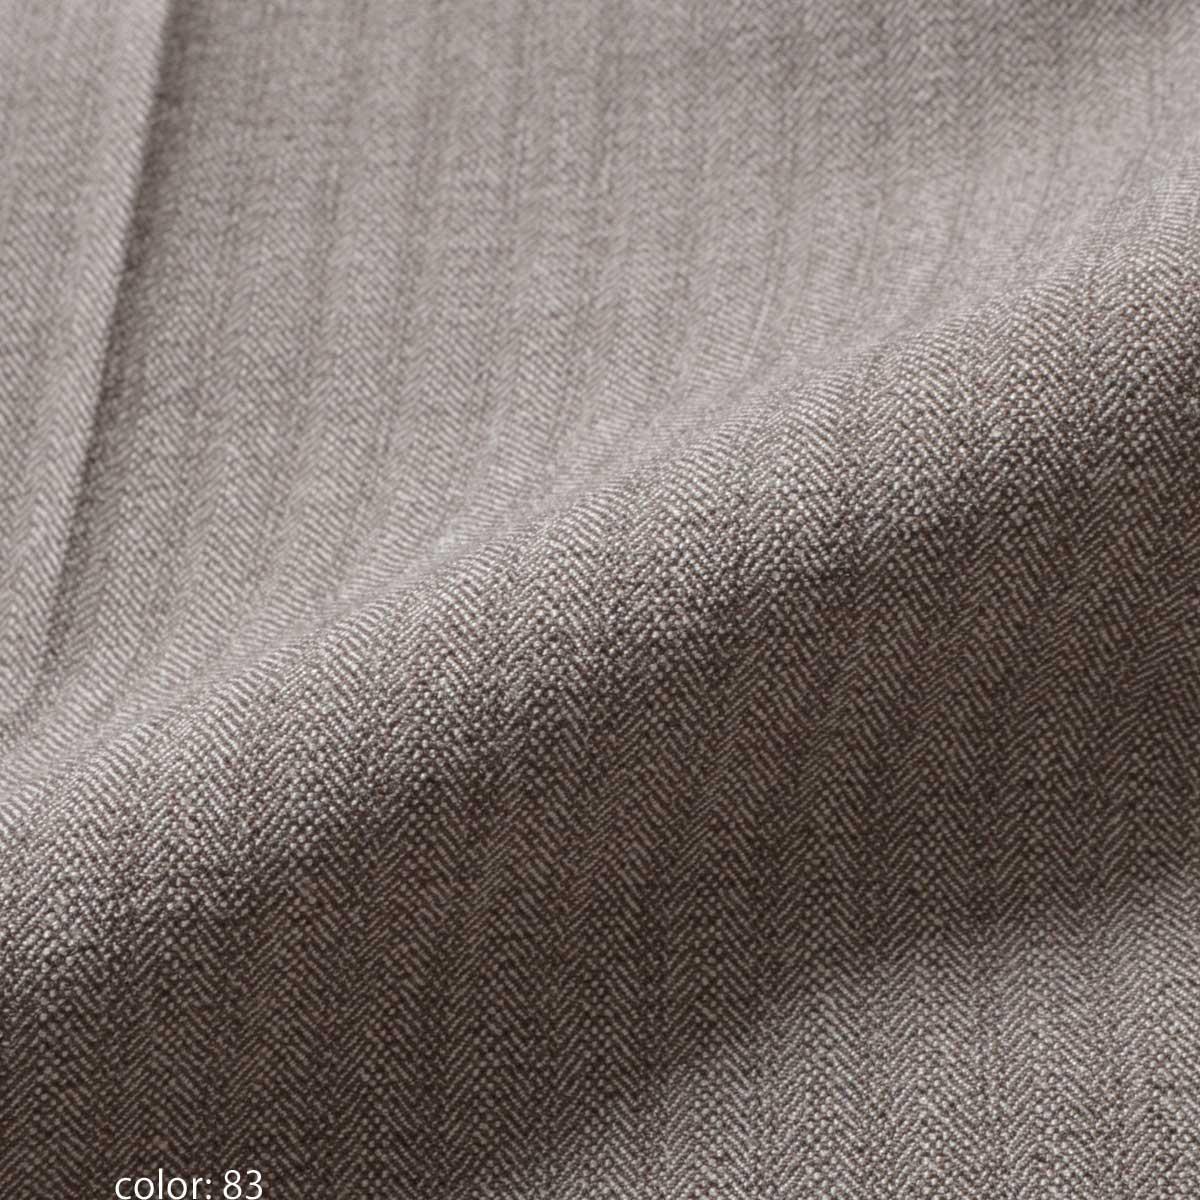 【SALE】Mrs.Jeana GOLD ■涼■ ストライプスレンダー GM3393